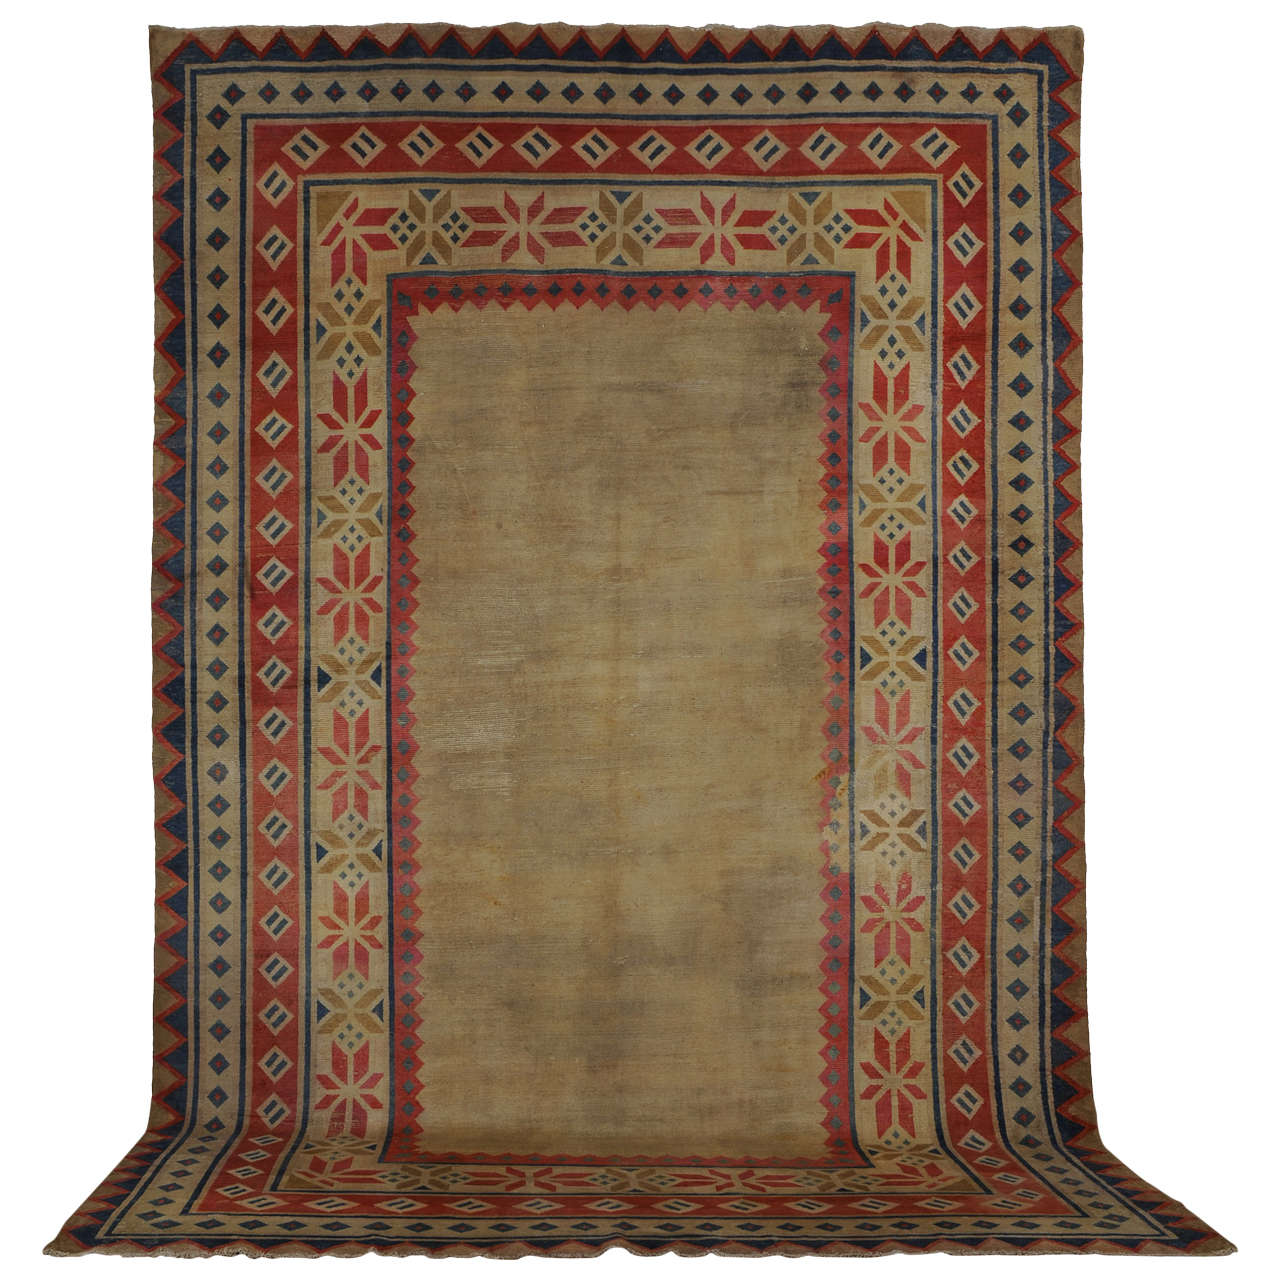 Antique Tibetan Rug: Rare Room Size Antique Tibetan Carpet For Sale At 1stdibs